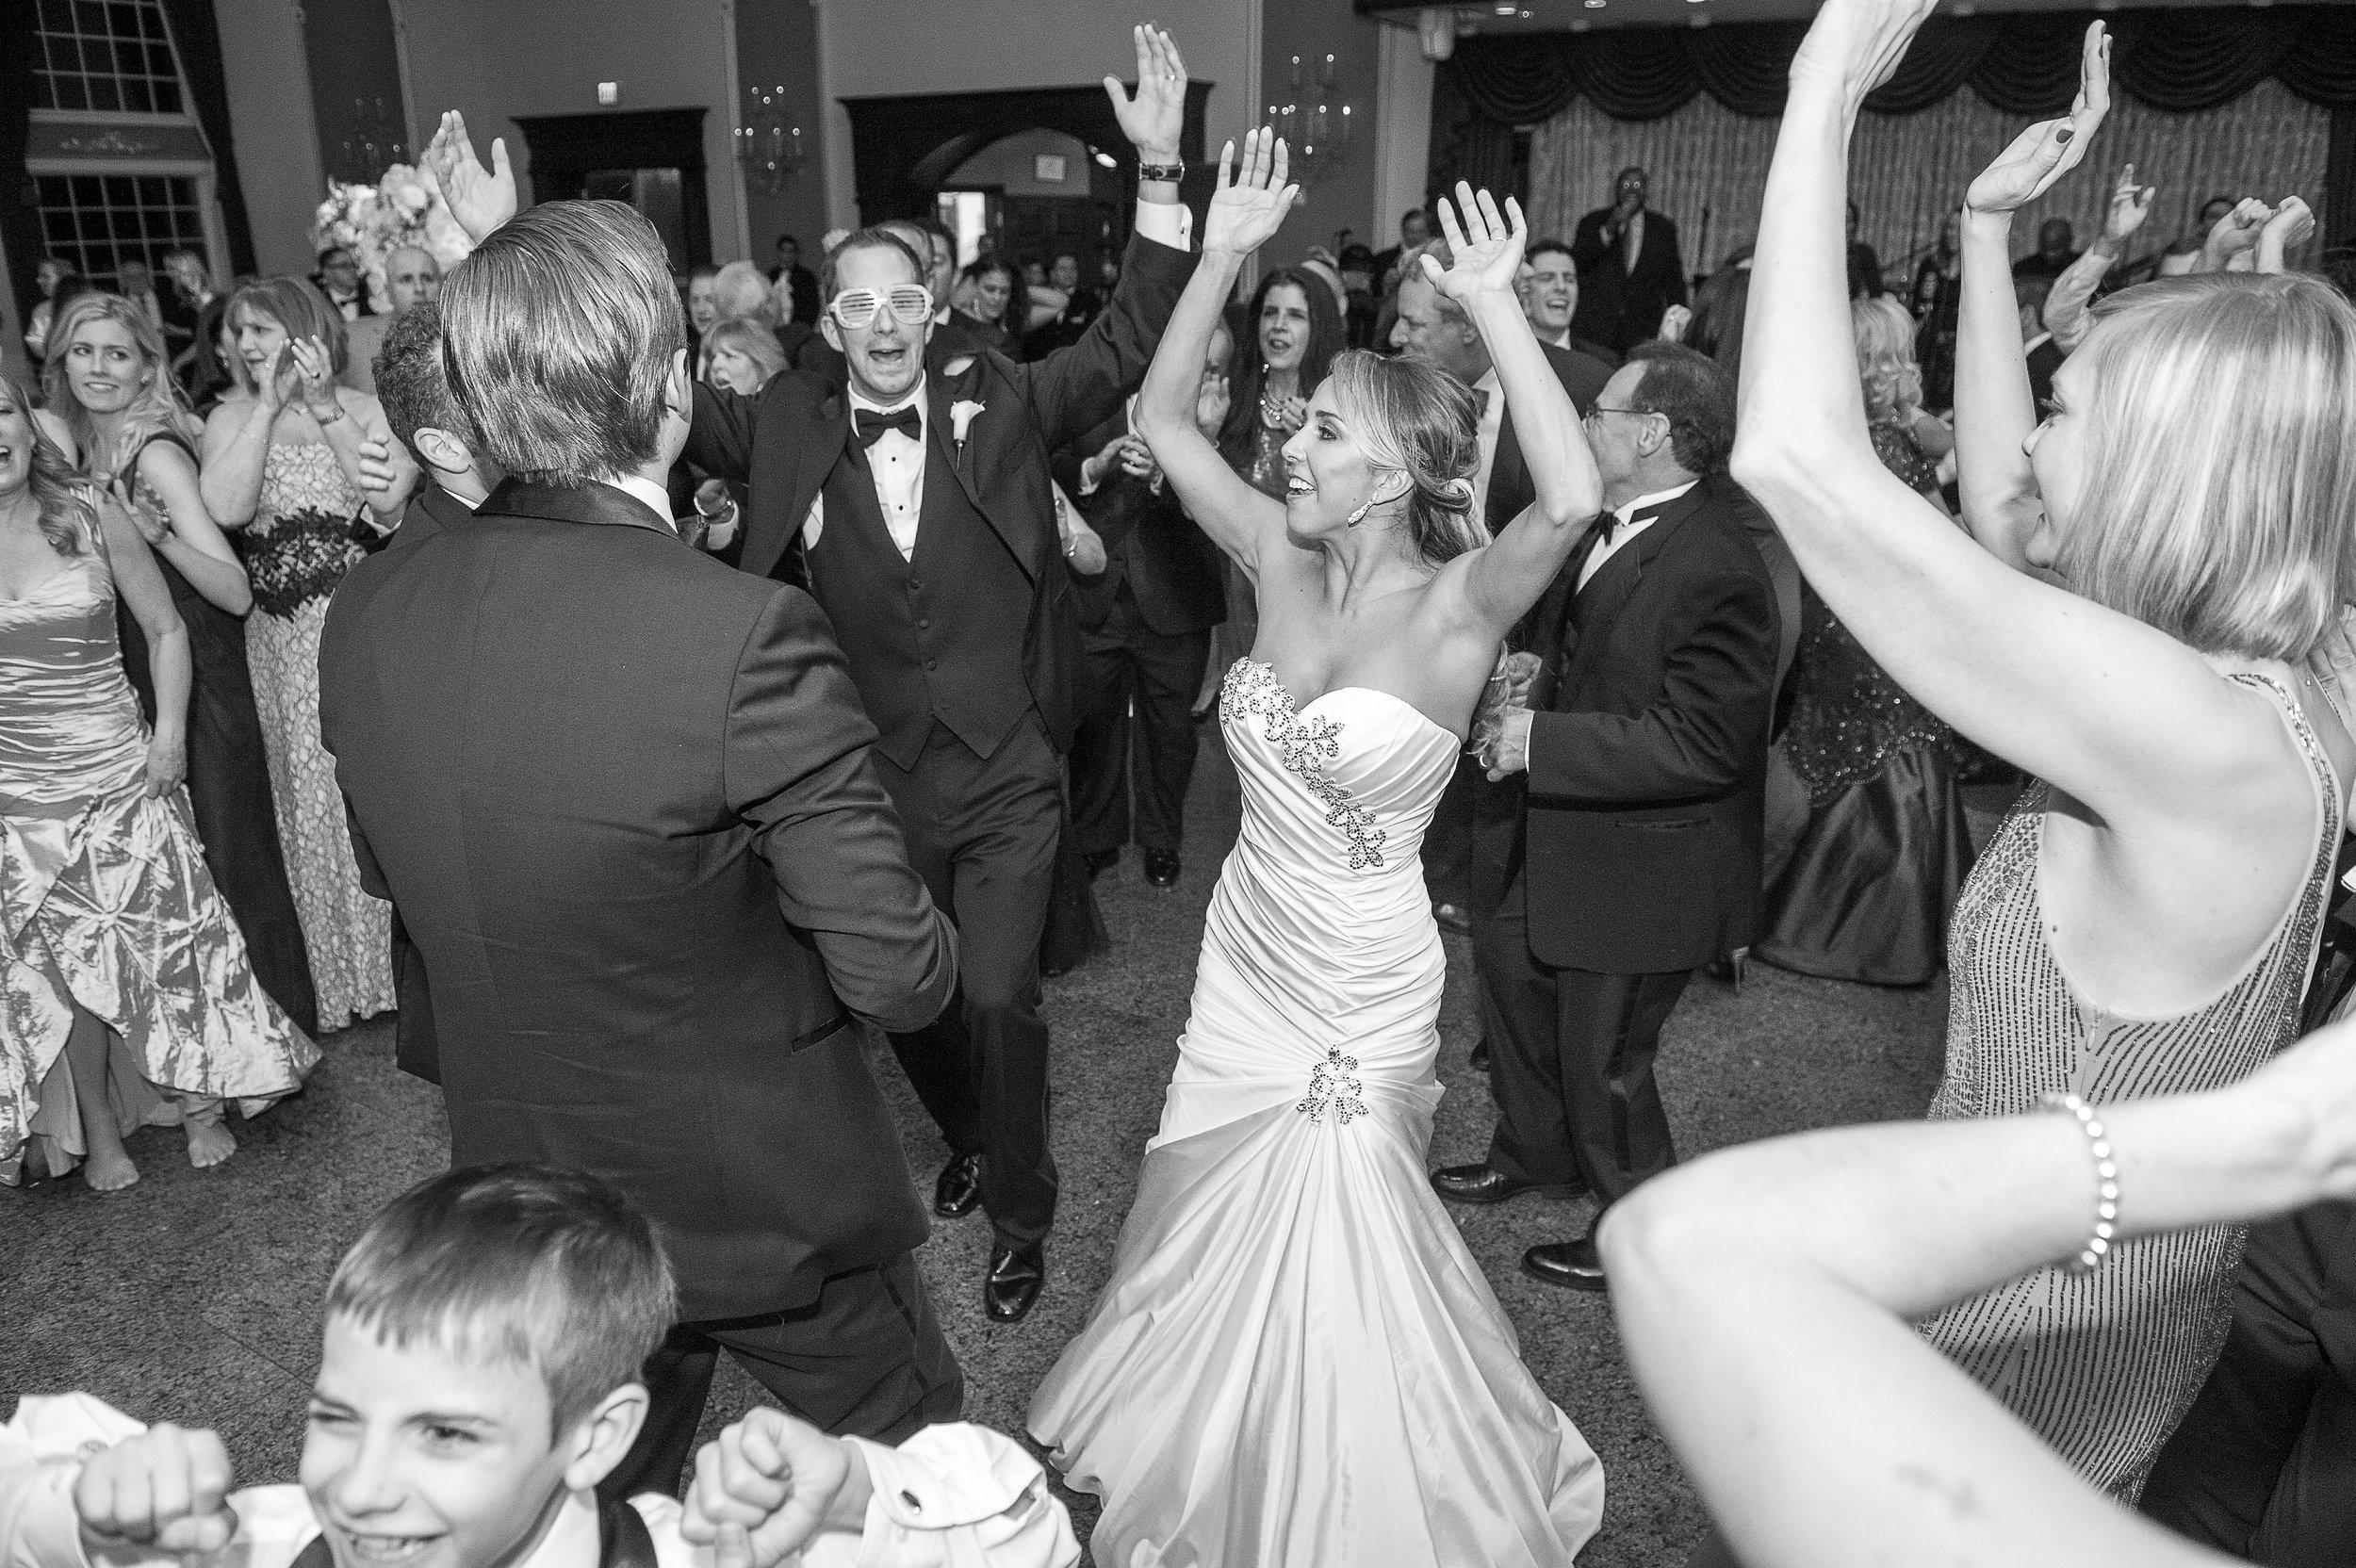 Ceci_New_York_Custom_Invitation_ New_Jersey_Wedding_Luxury_Personalized_Ceci_Style_Bride_Foil_Stamping123.JPG